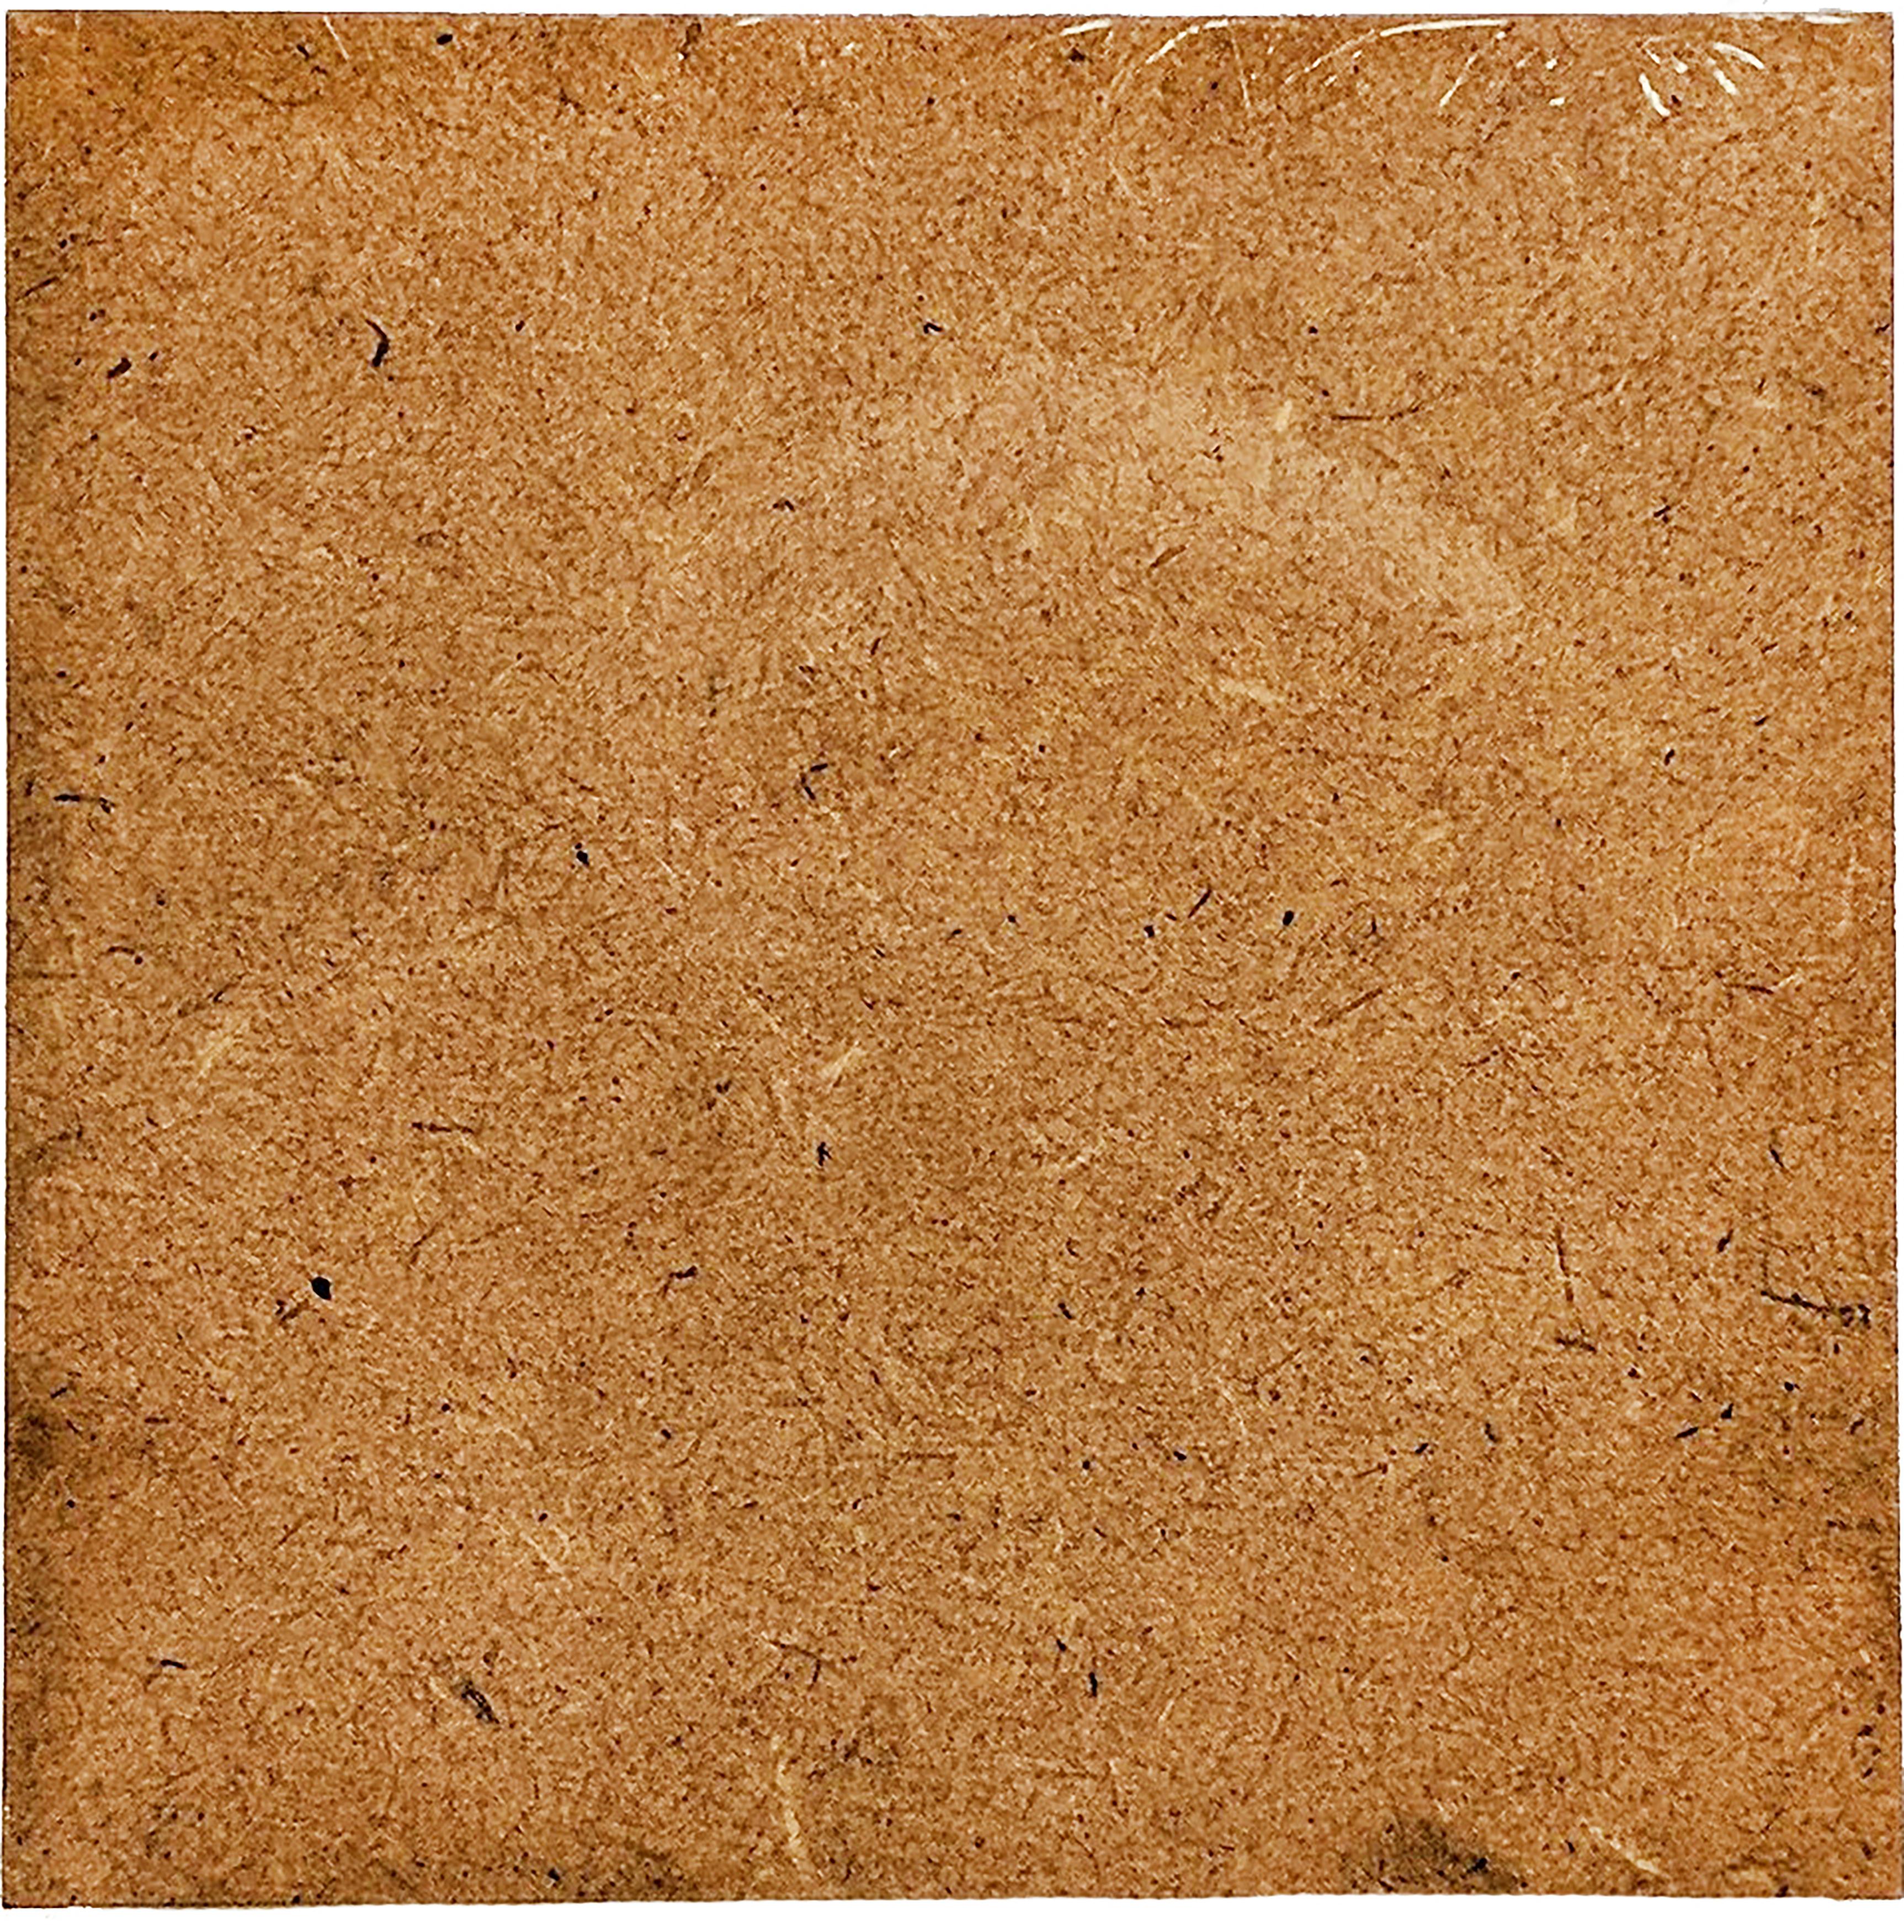 FD Plain wood for shadowbox 4 x 4